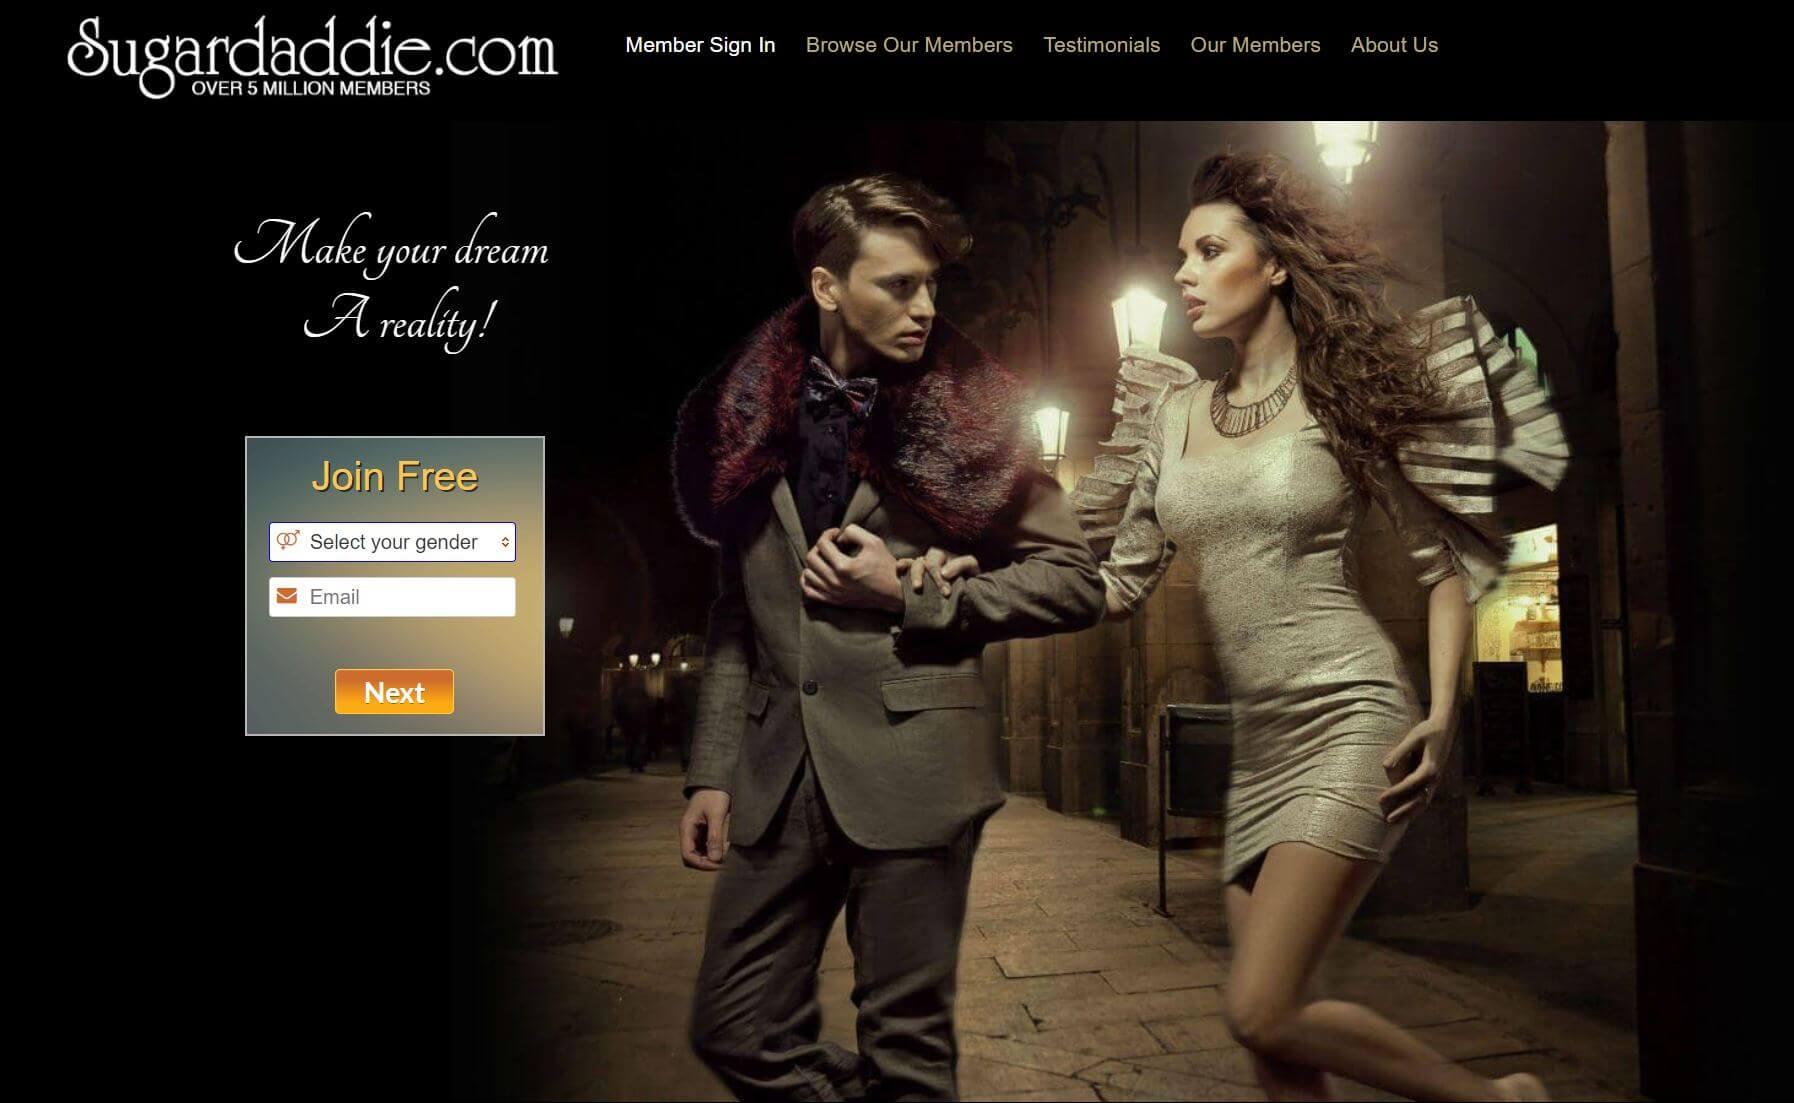 sugar daddie site homepage